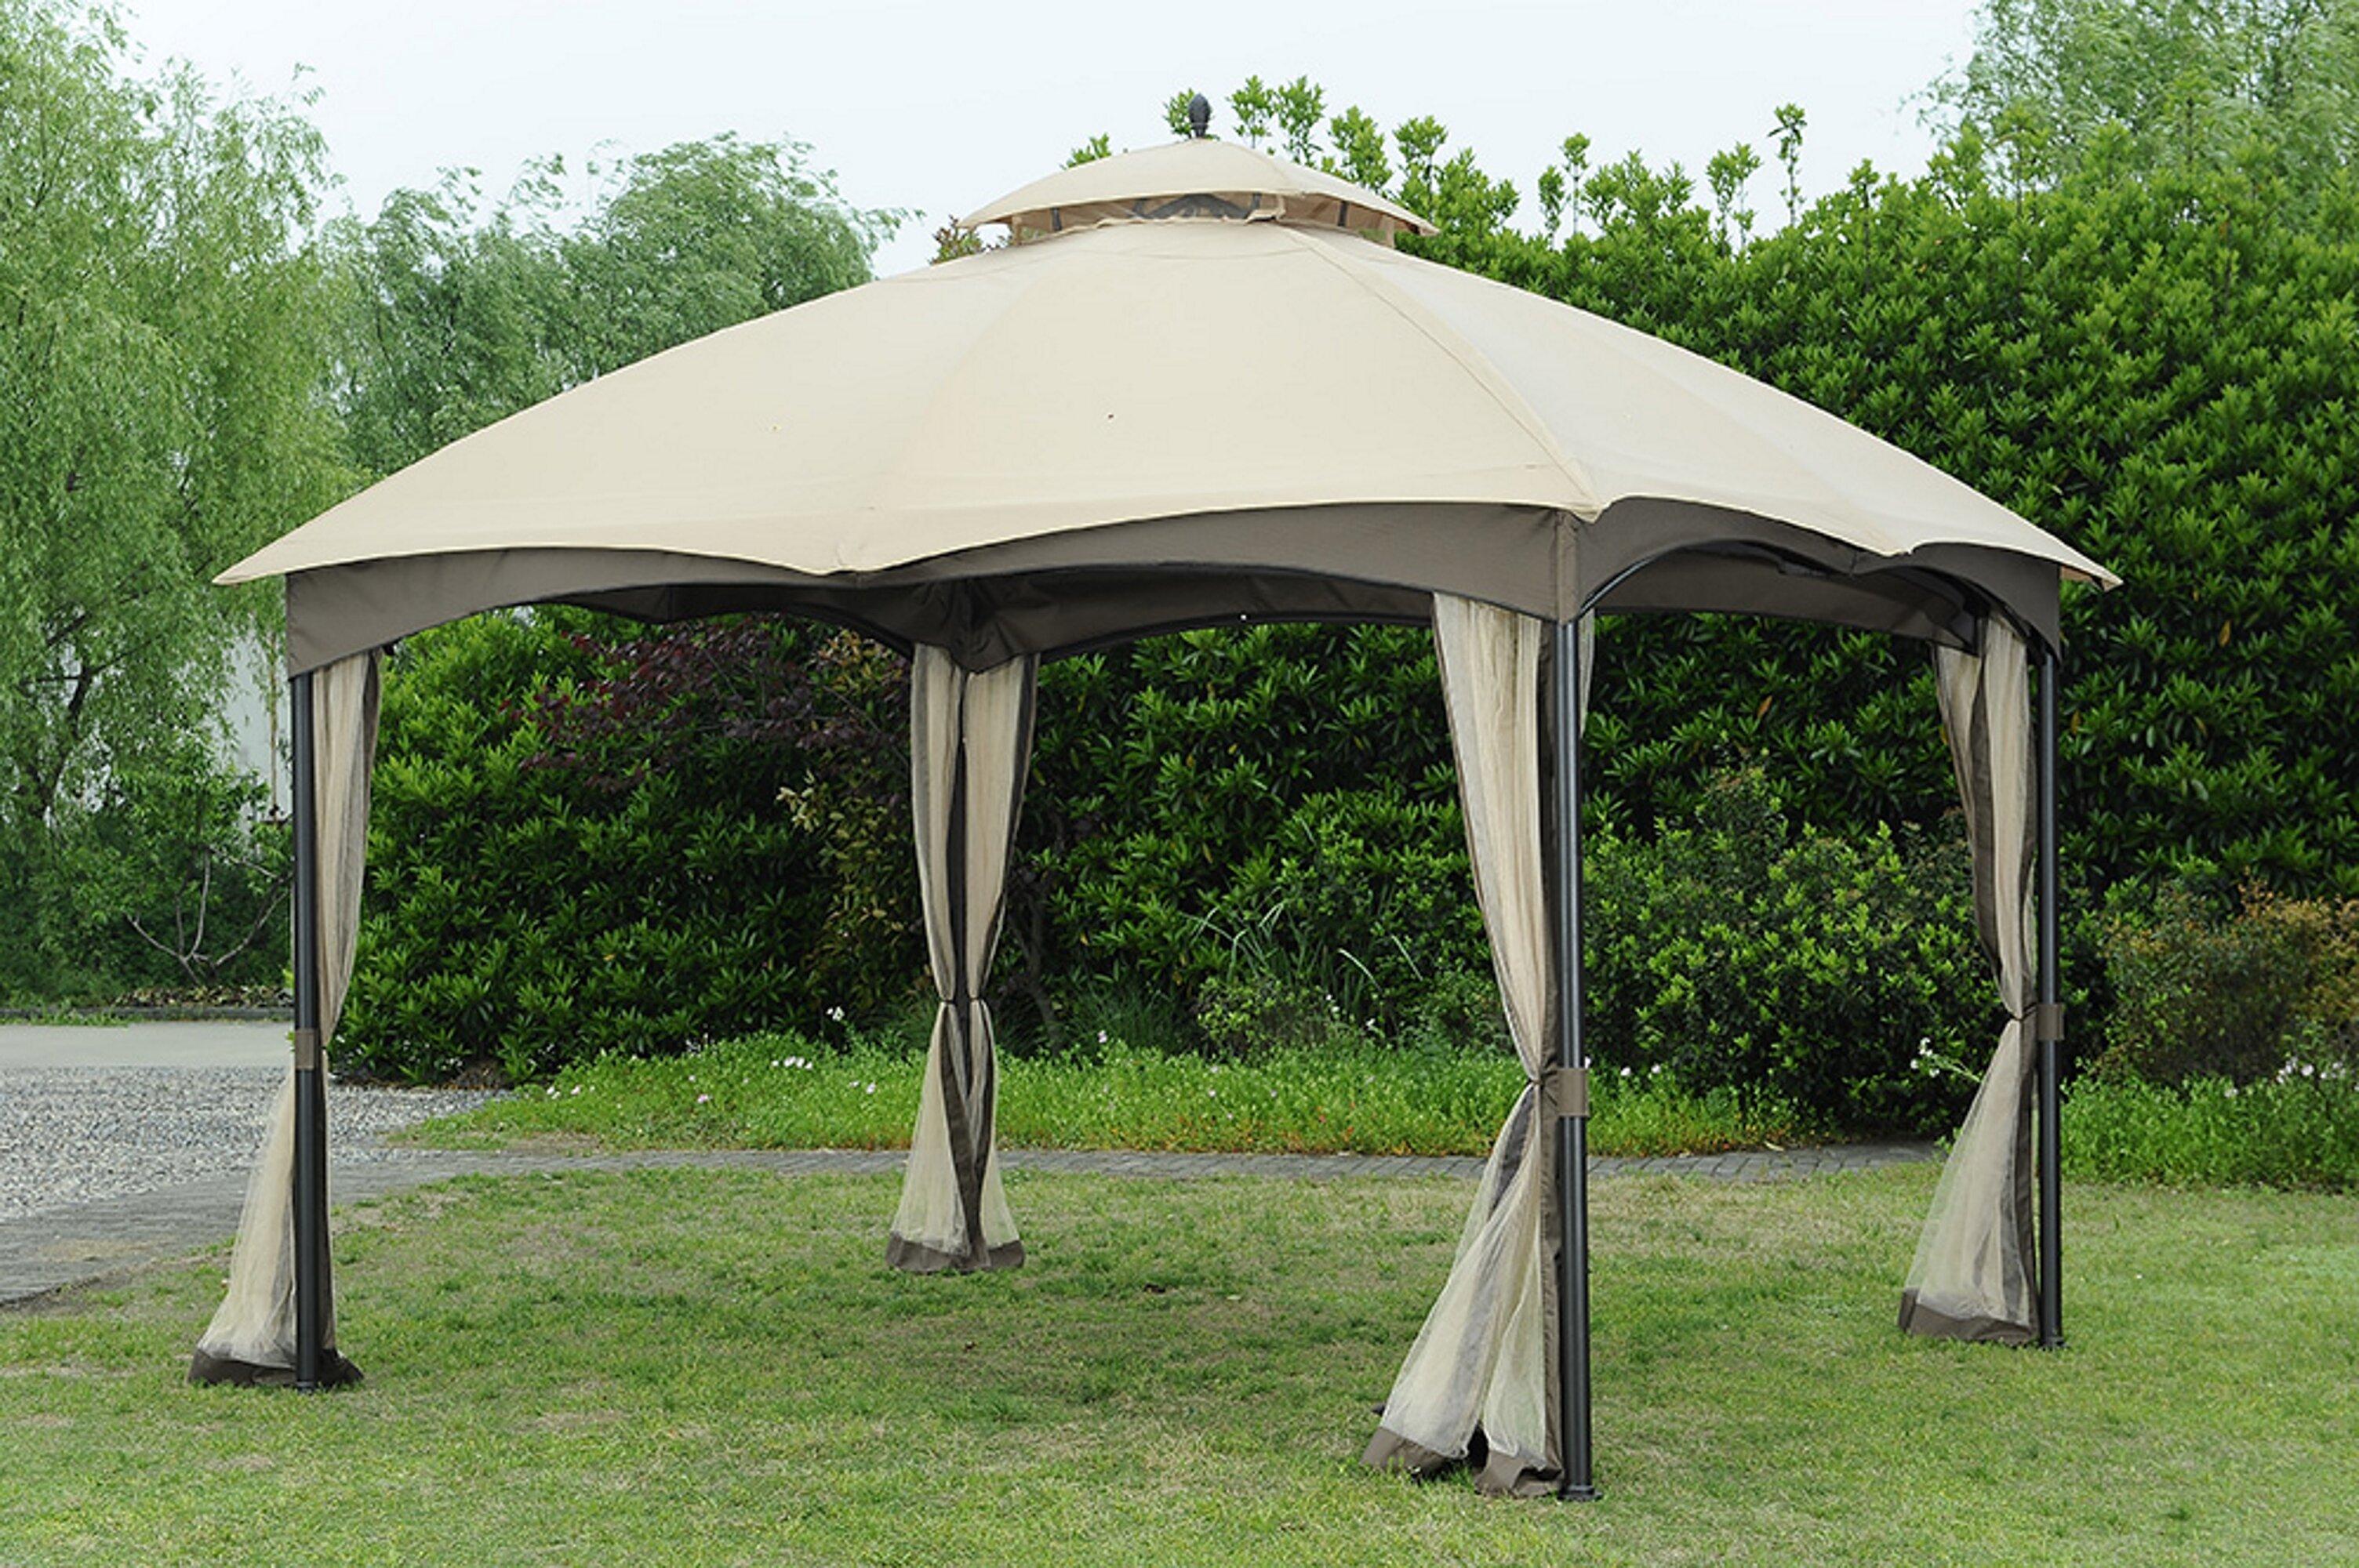 Hampton bay gazebo replacement top for 11 ft. X 11 ft. Aluminum.